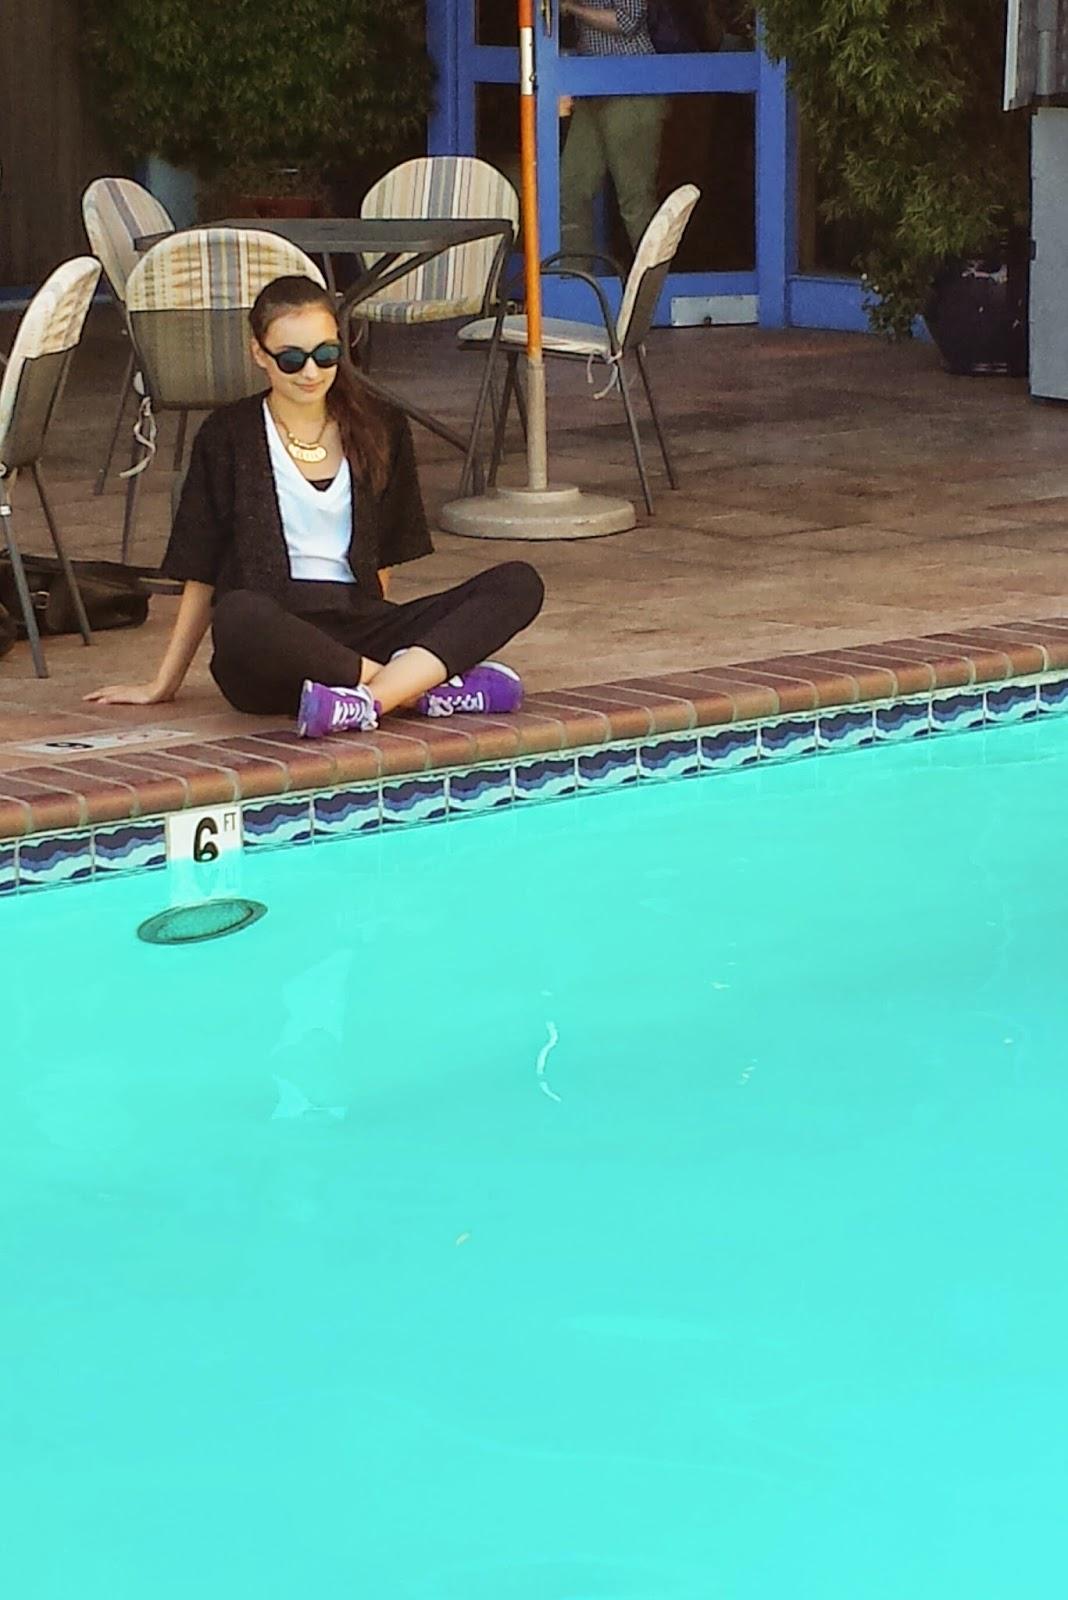 Pool, The Waterfront Hotel, Audrey Sides, Fashion BLogger, Fashion Blog, Fashion, Wasian, Oakland, Jack London Square, San Francisco, Bay Area, SF Fashion Blogger,